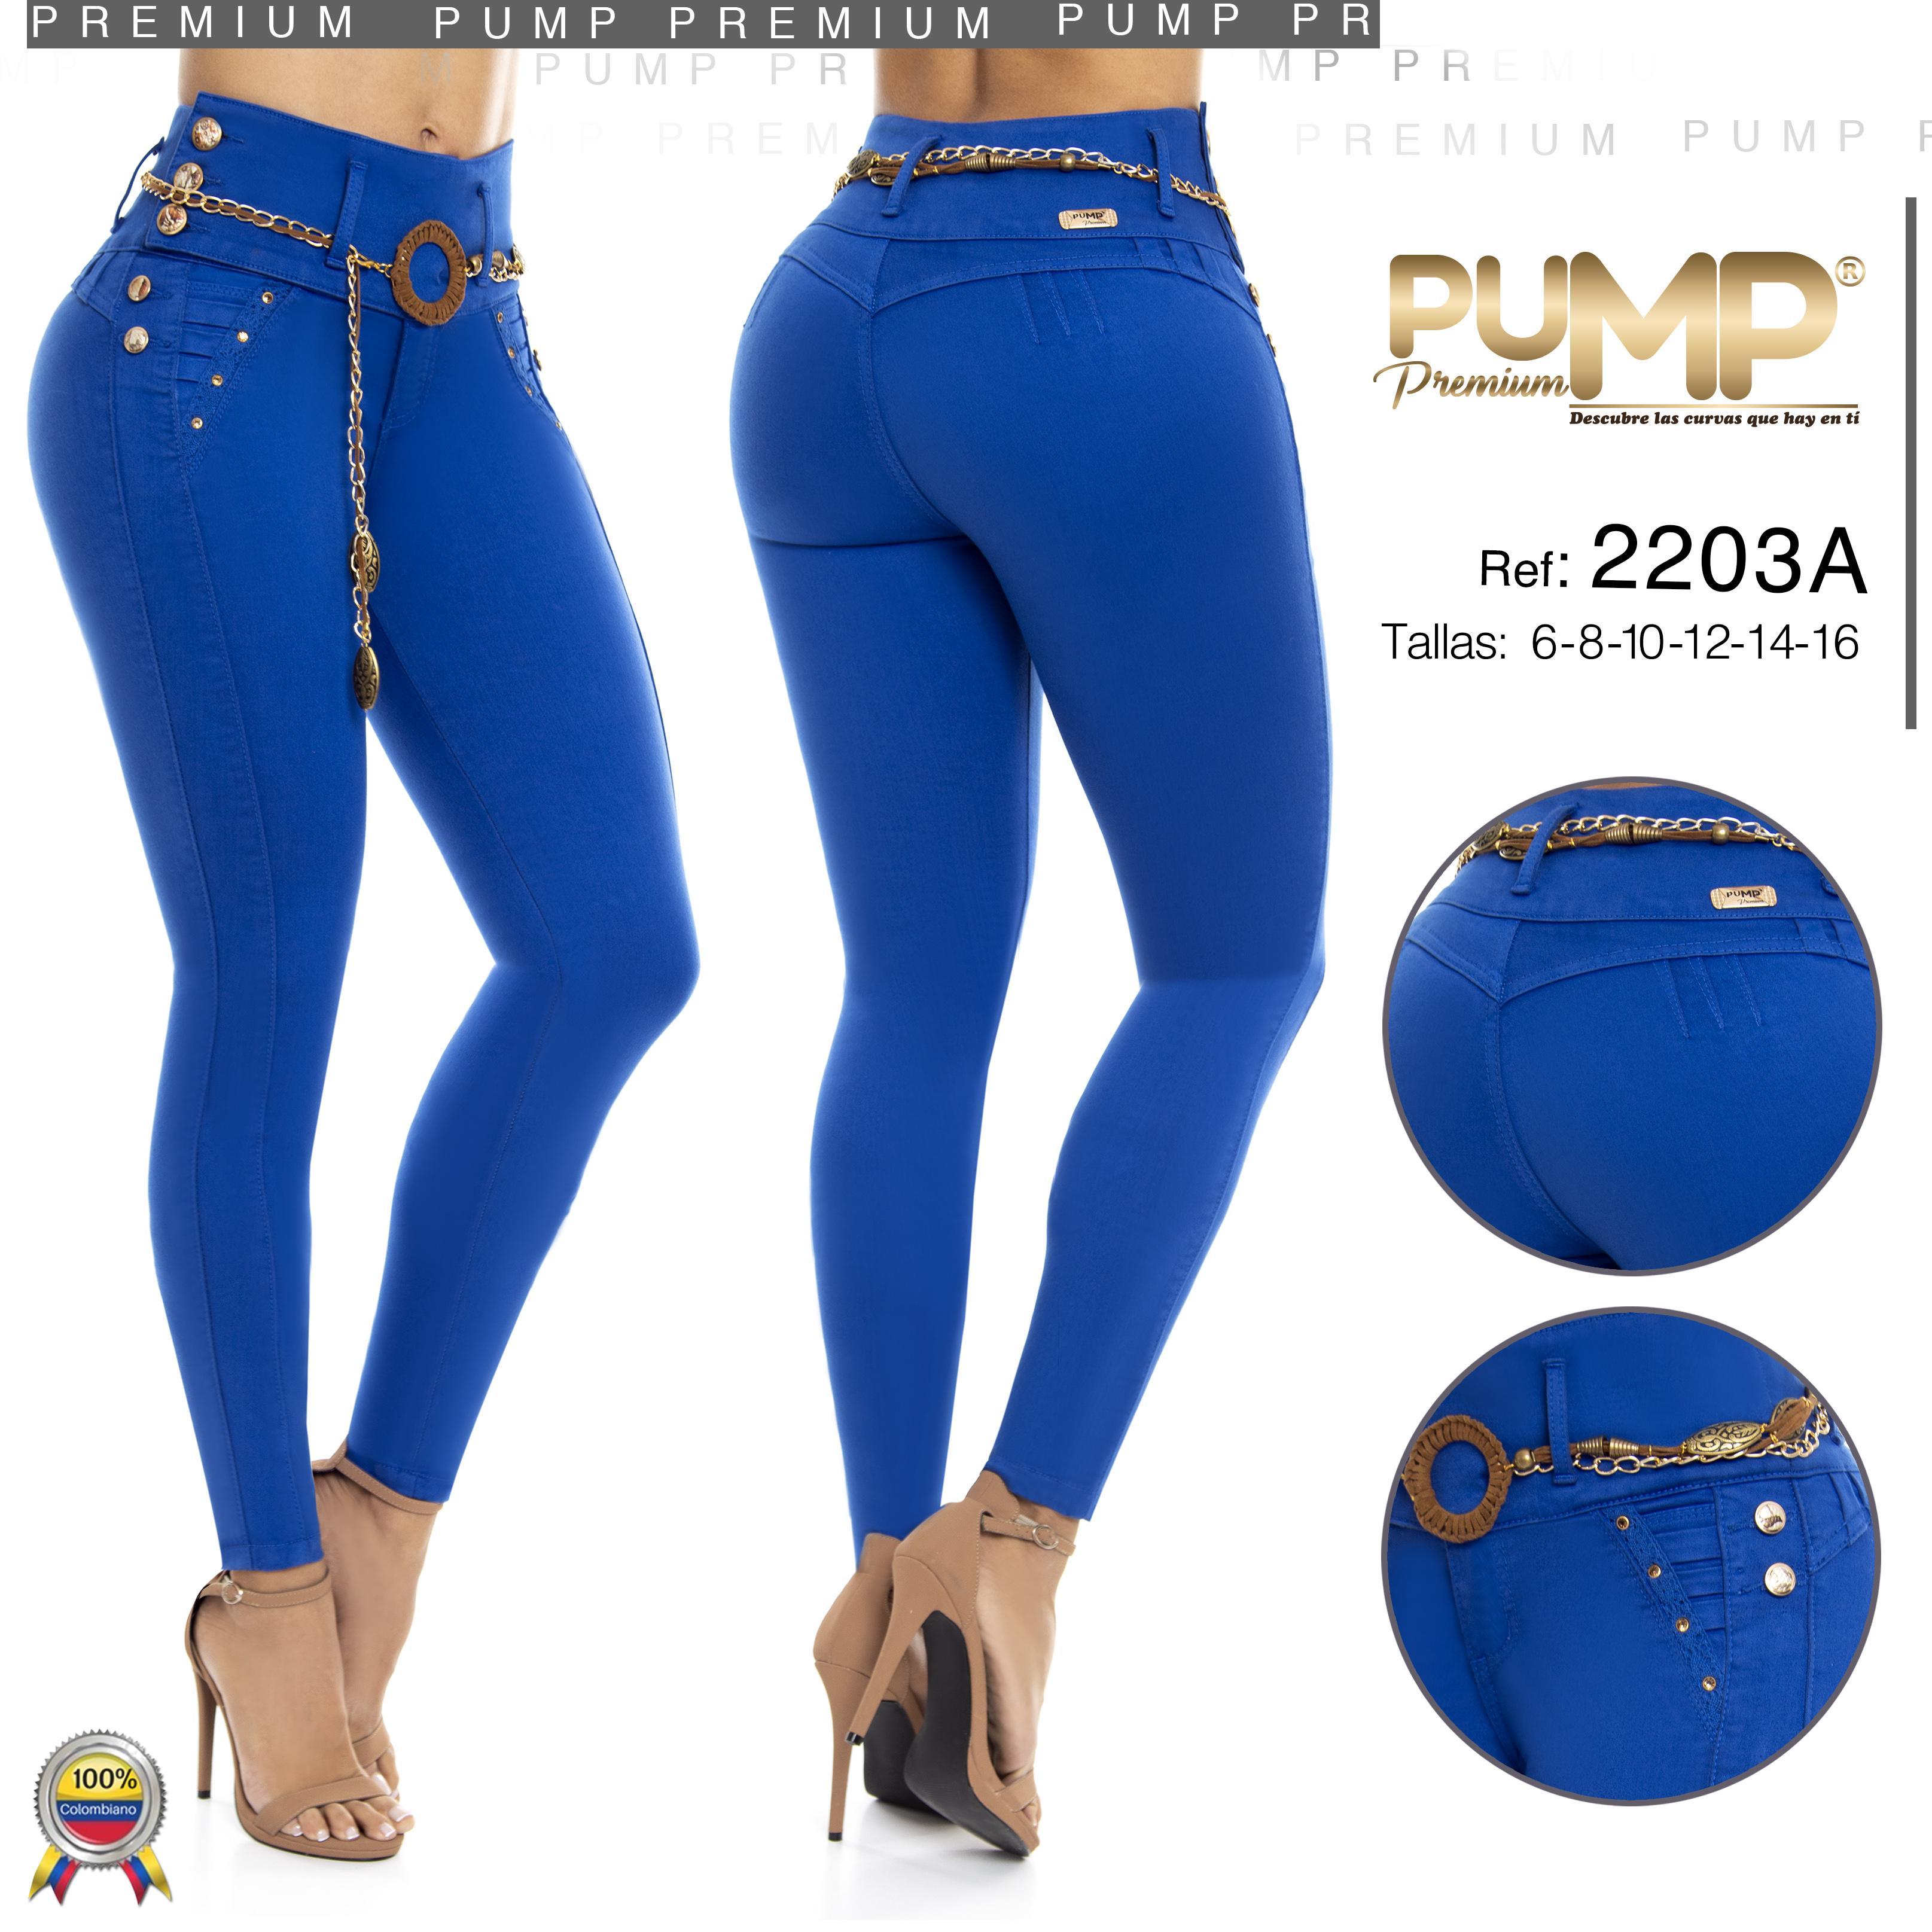 Jeans colombianos push up de moda